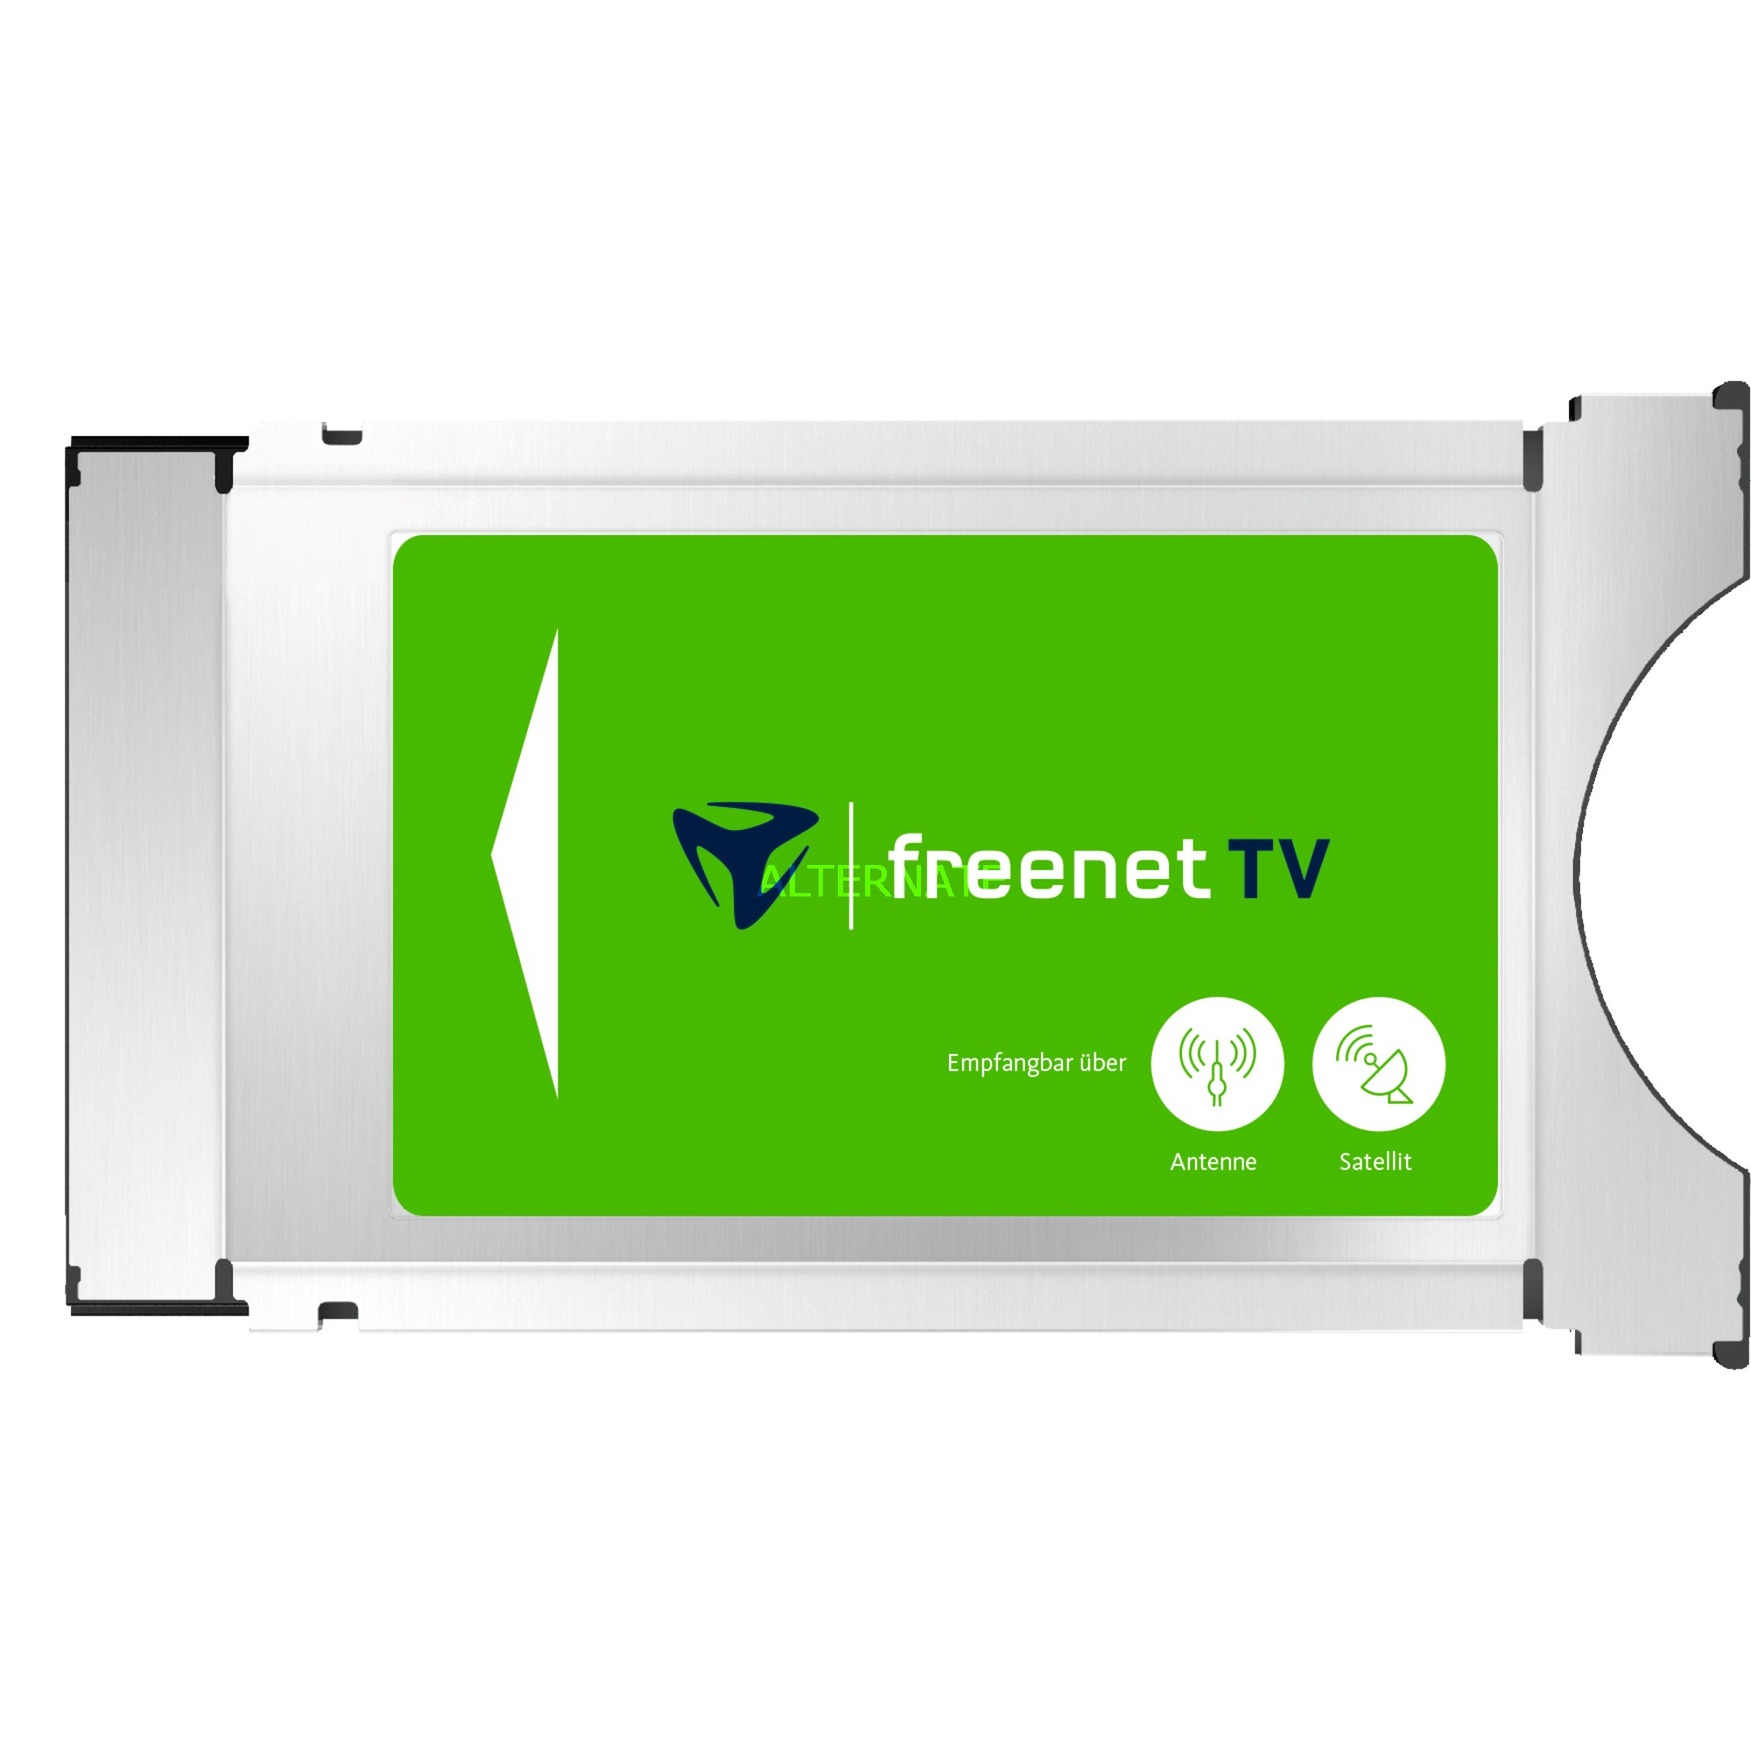 Freenet TV DVB-T2 HD CI+ Modul